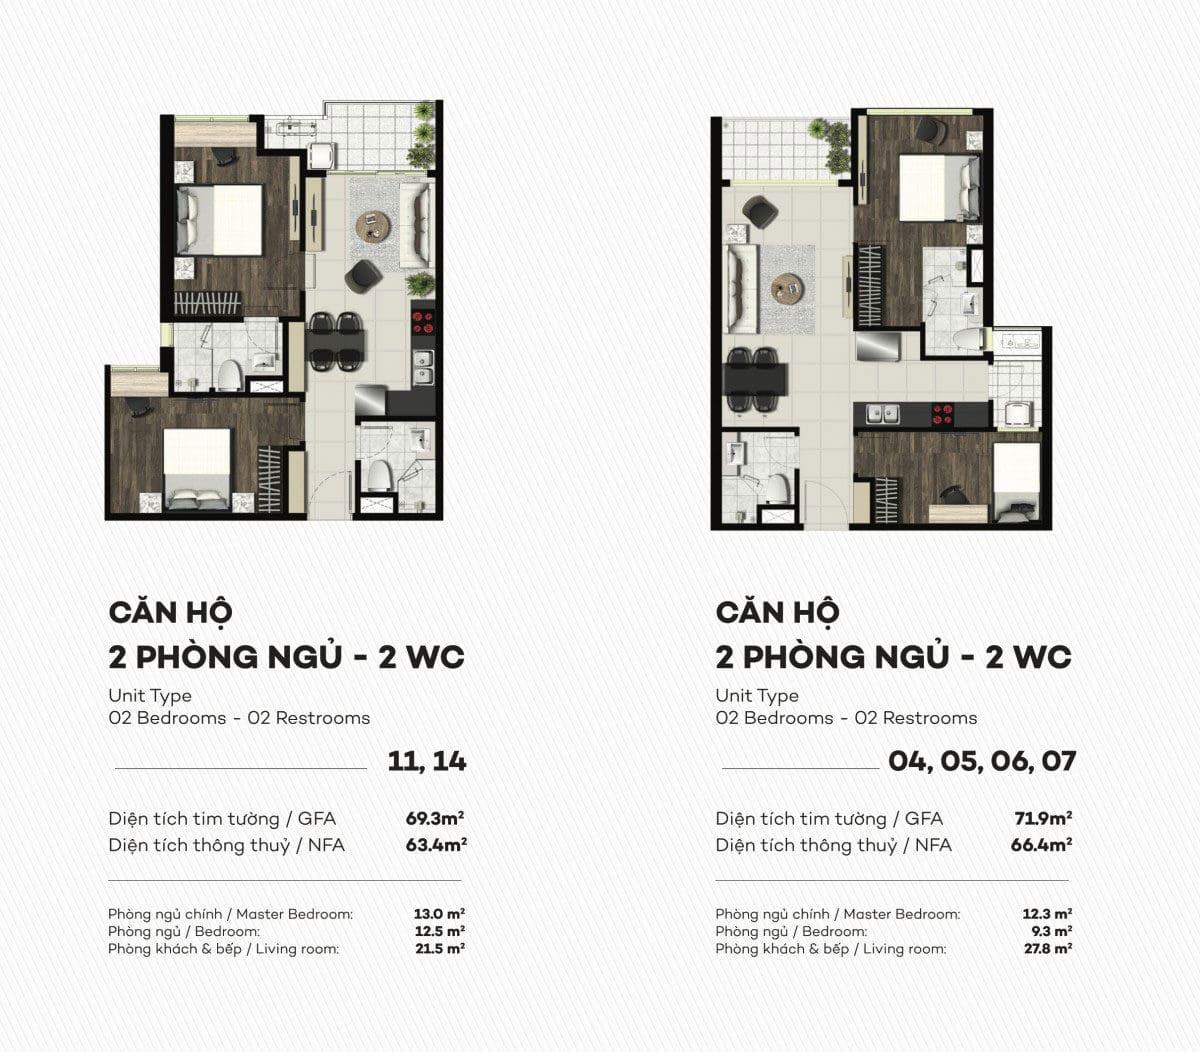 Thiết kế căn hộ 2 PN Smartel Signial Quận 7